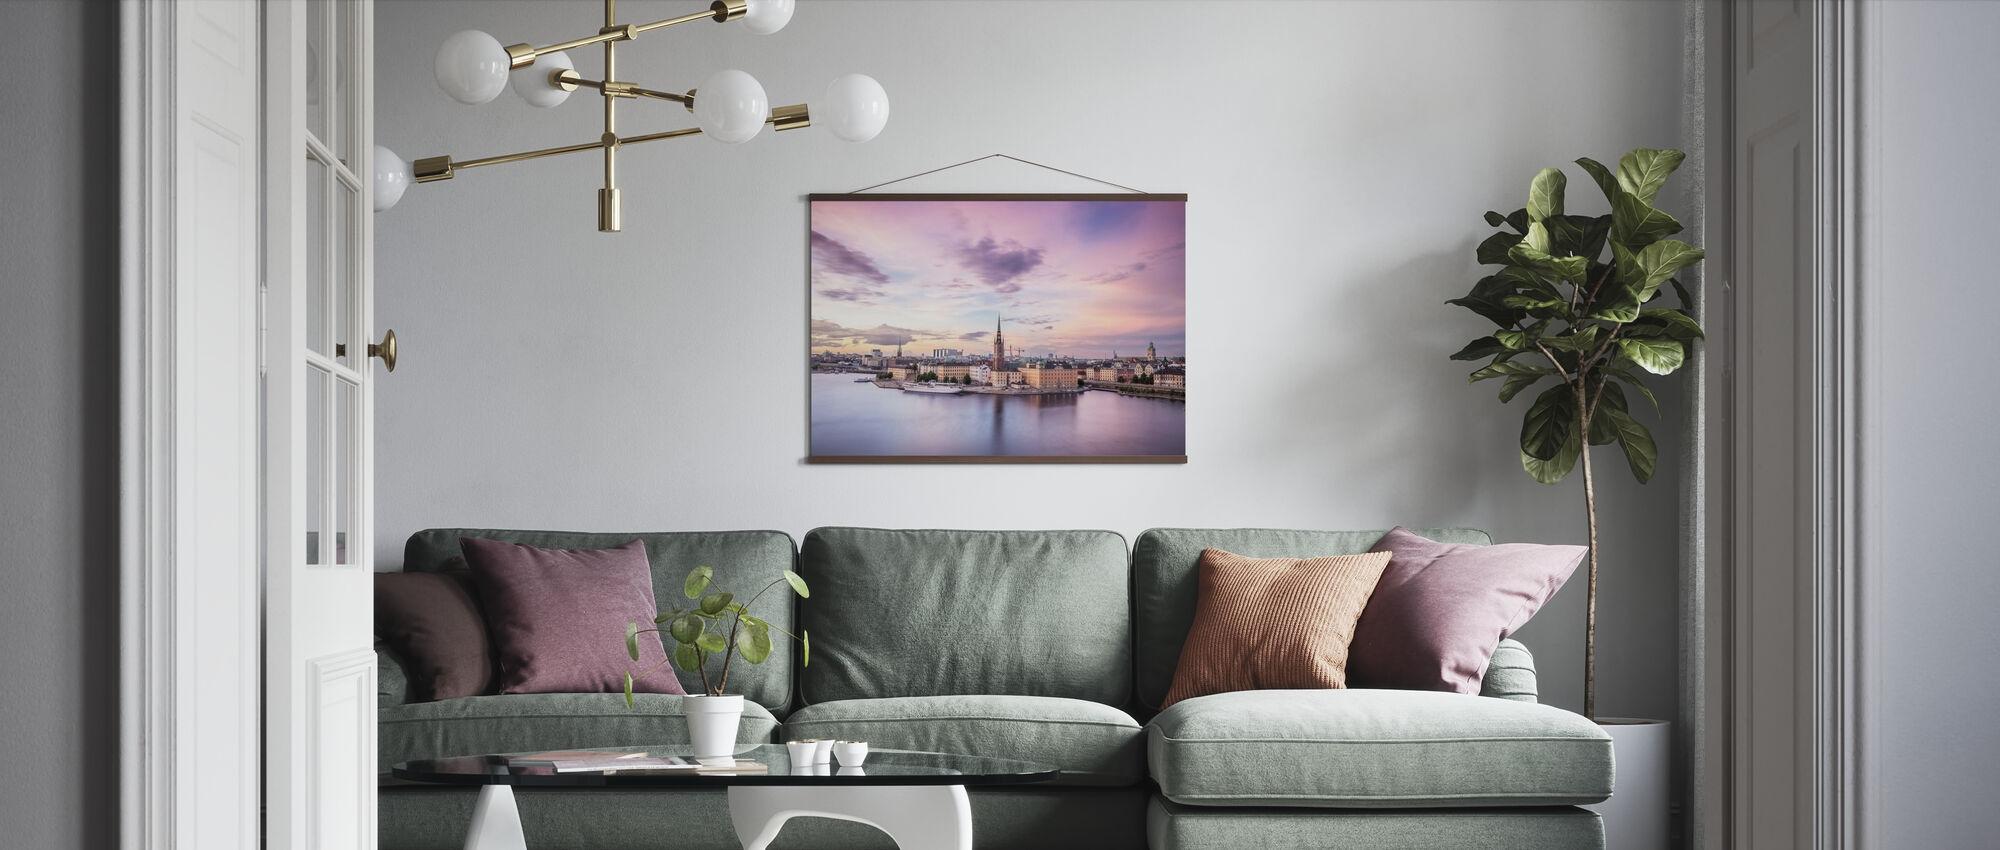 Stockholm Overview - Poster - Living Room